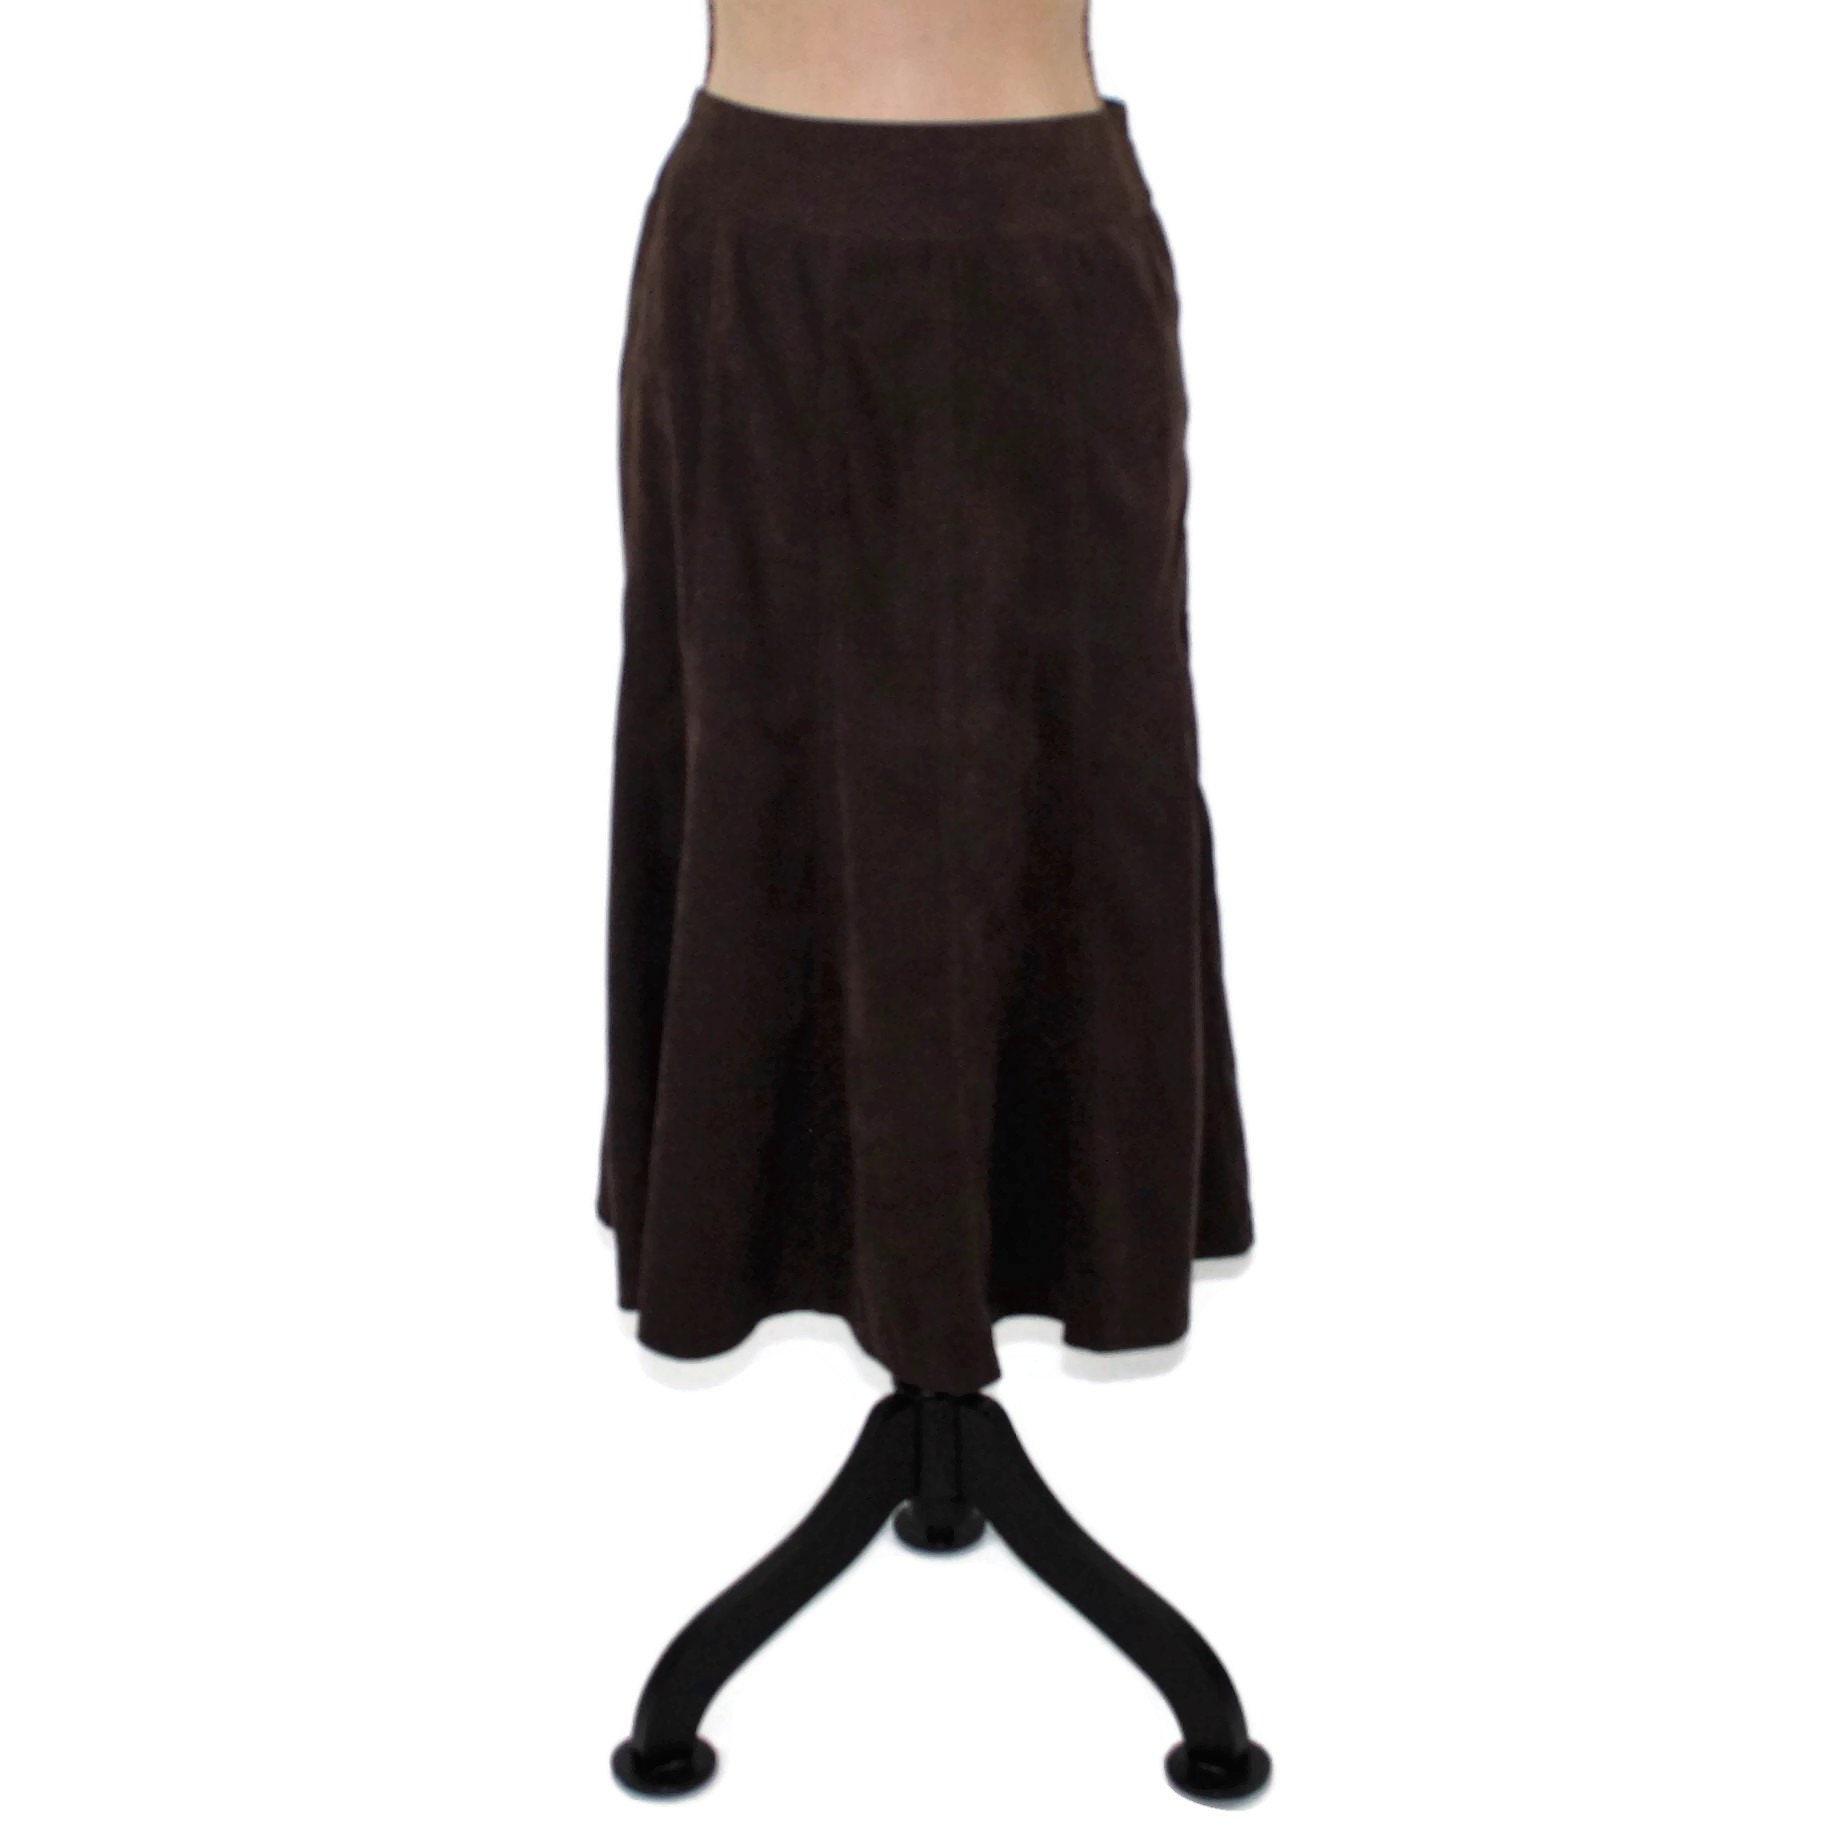 1982f4cee58 Dark Brown Skirt Women Medium Large Flared Midi Skirt Casual   Etsy